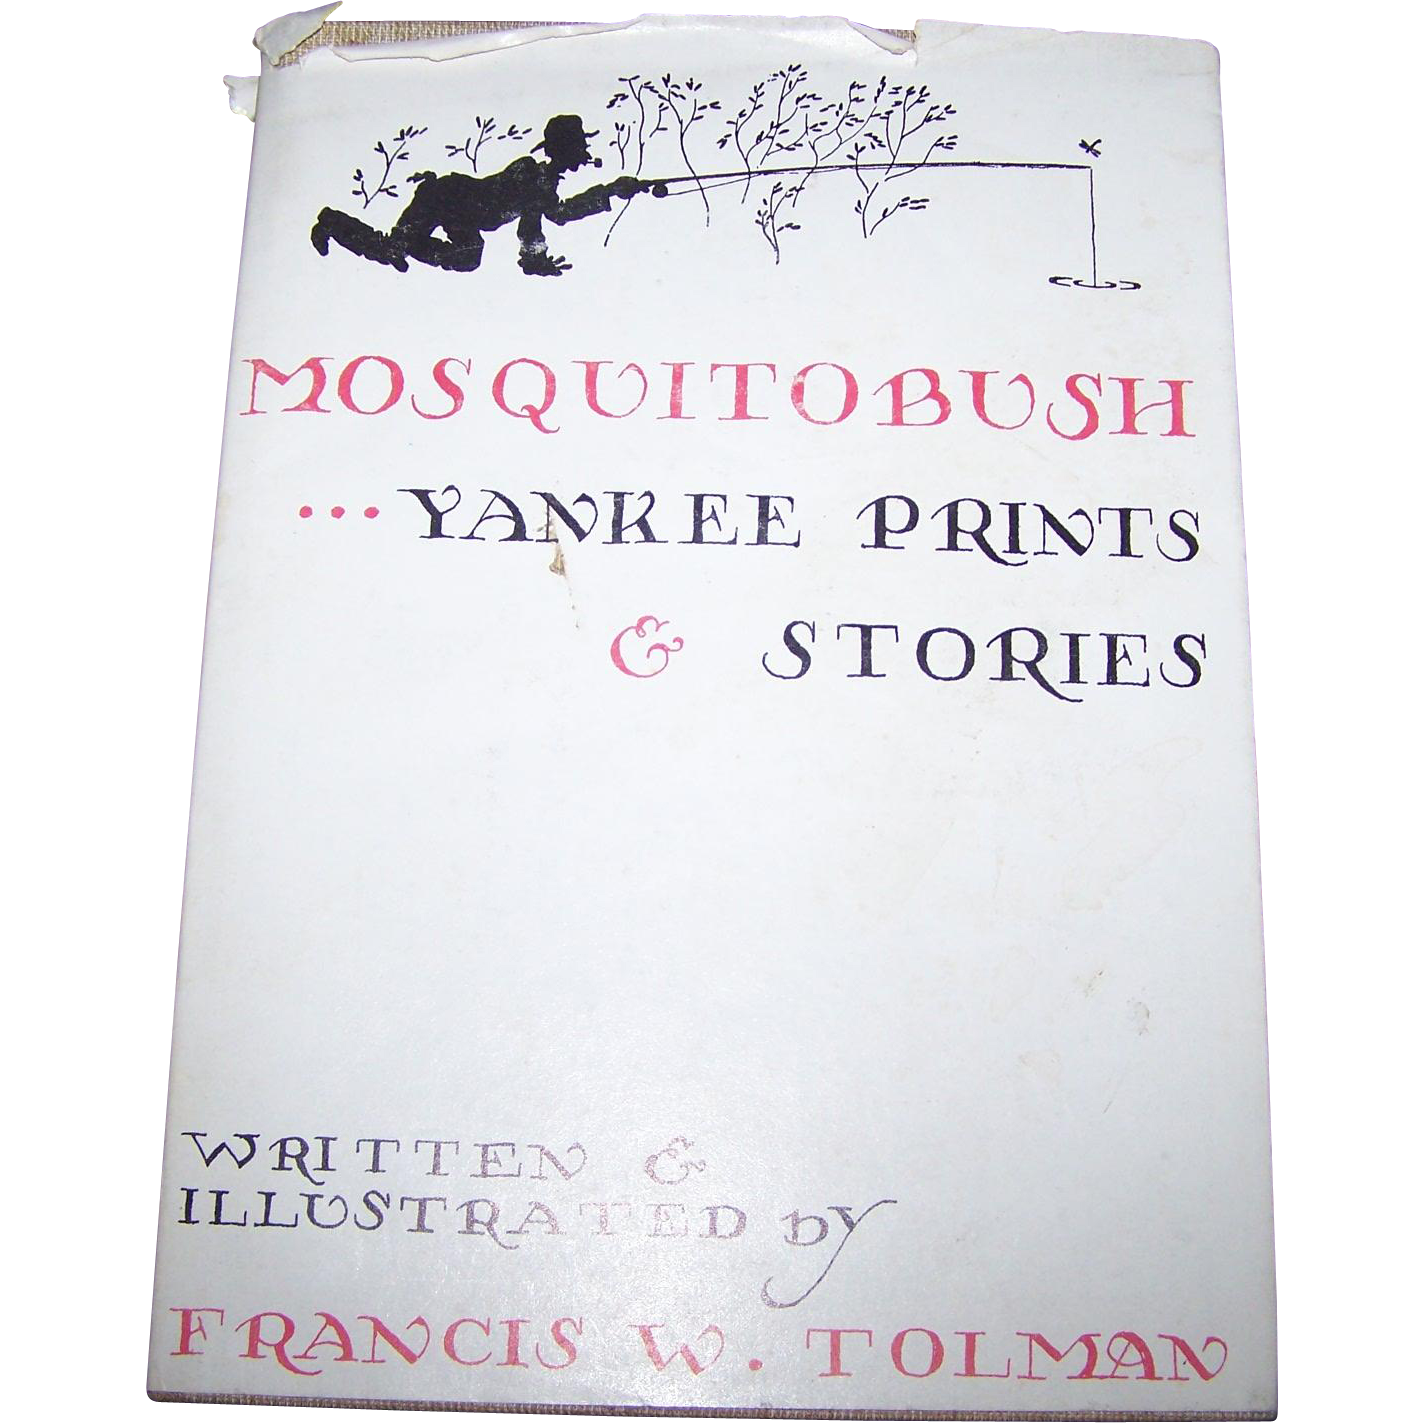 Mosquitobush Yankee Prints & Stories By Francis W. Tolman